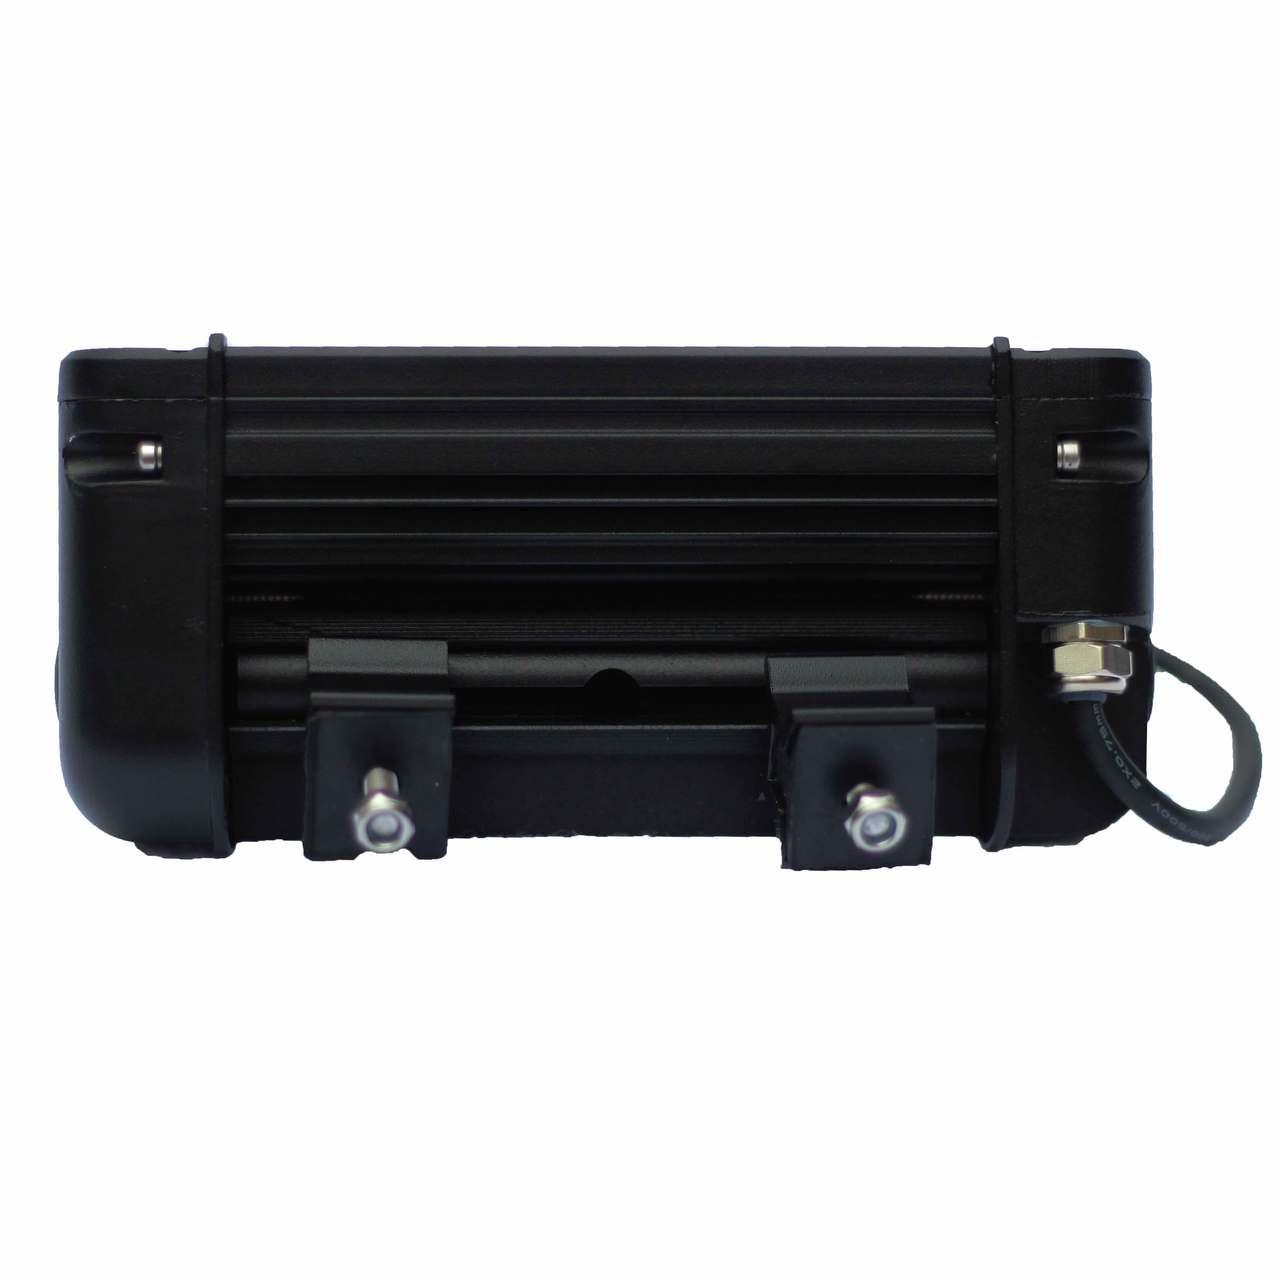 "8"" Southern lite LED Light Bar (Includes 40 Watt Light Bar and Wiring Harness)"